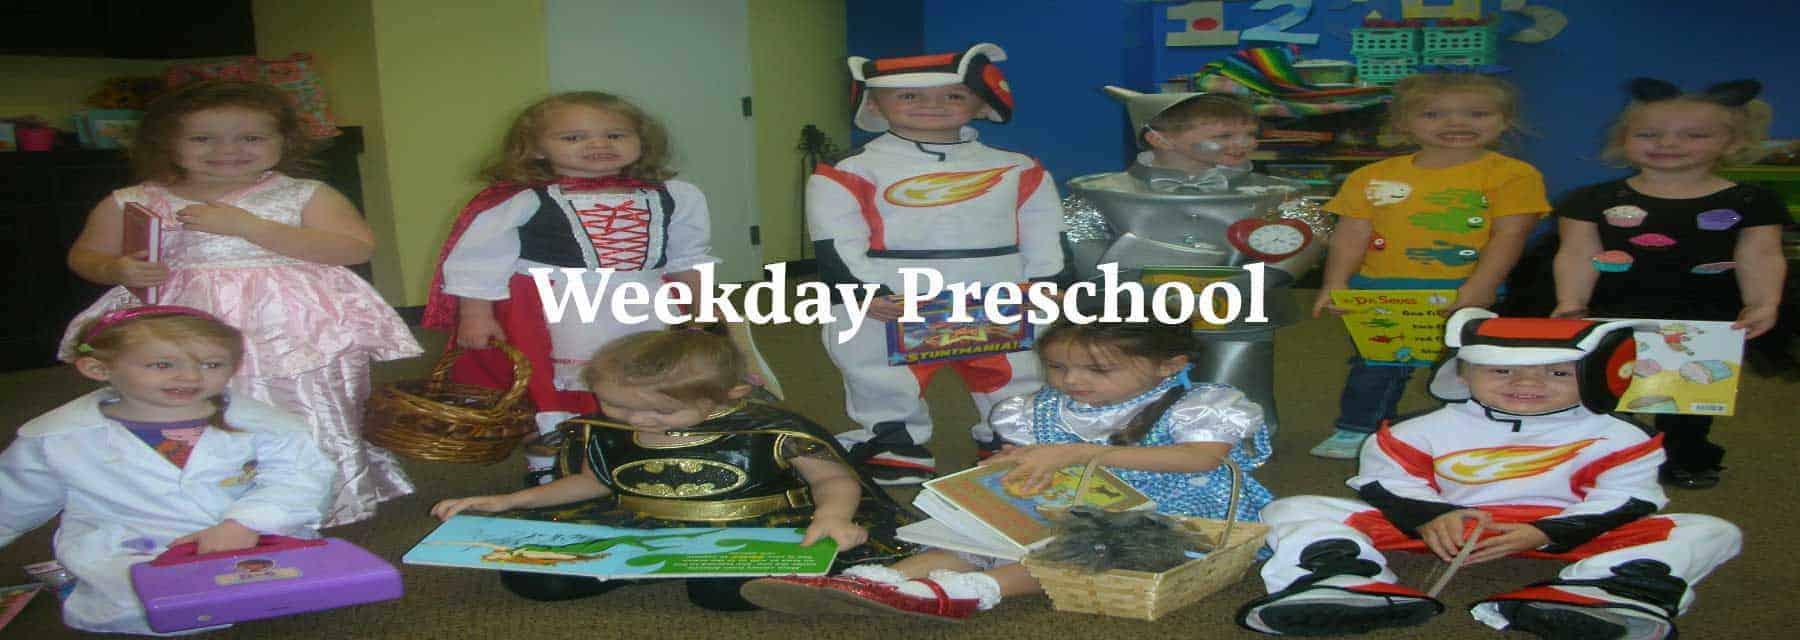 weekday_preschool2